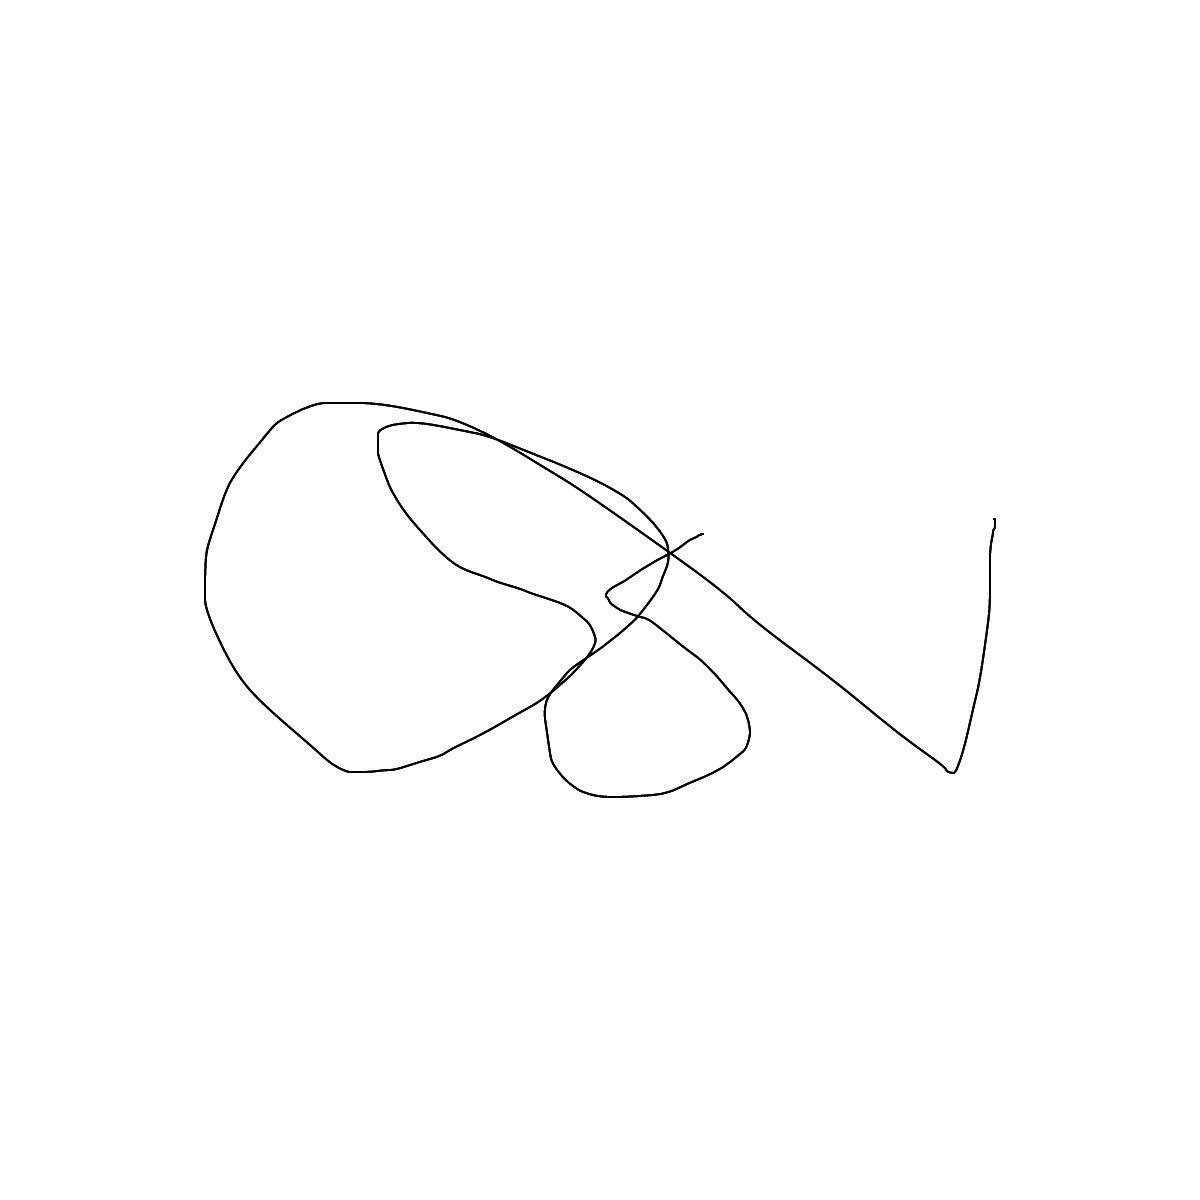 BAAAM drawing#17526 lat:50.2817535400390600lng: 13.7288694381713870